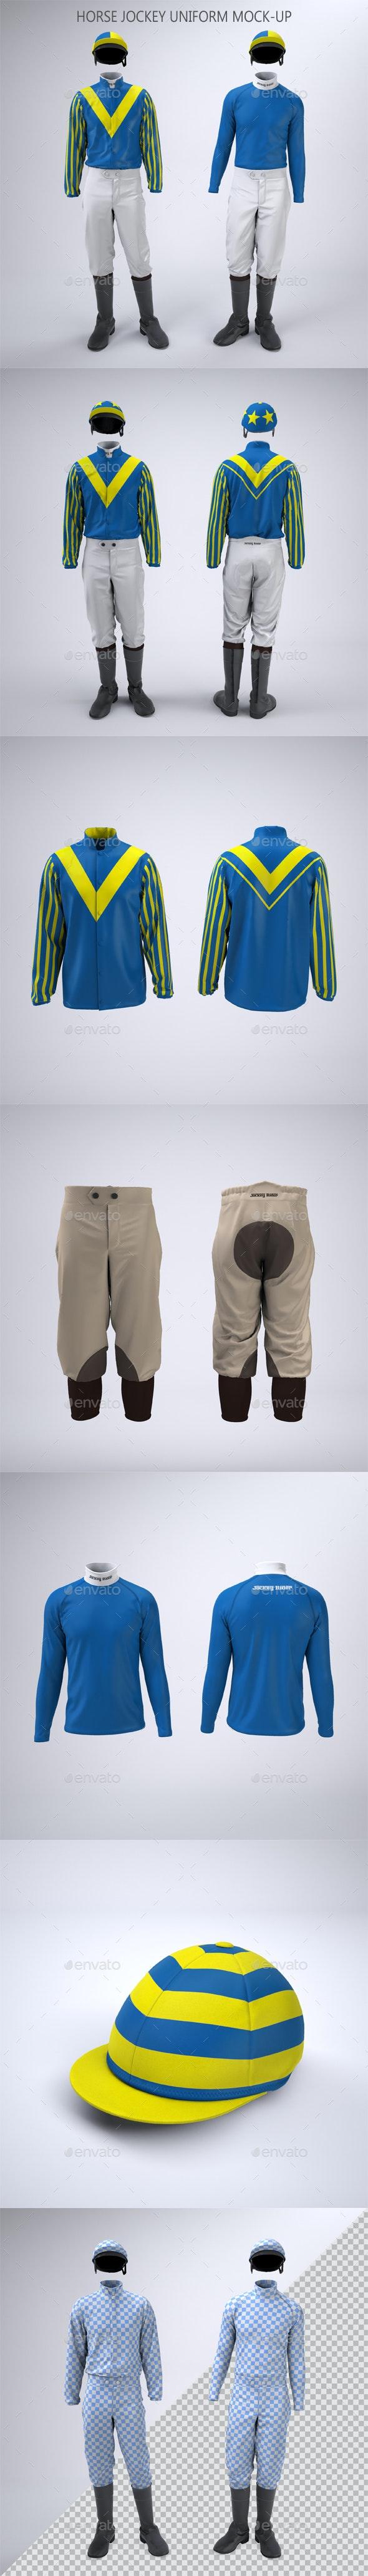 Horse Racing Jockey Uniform Mock-Up - Apparel Product Mock-Ups